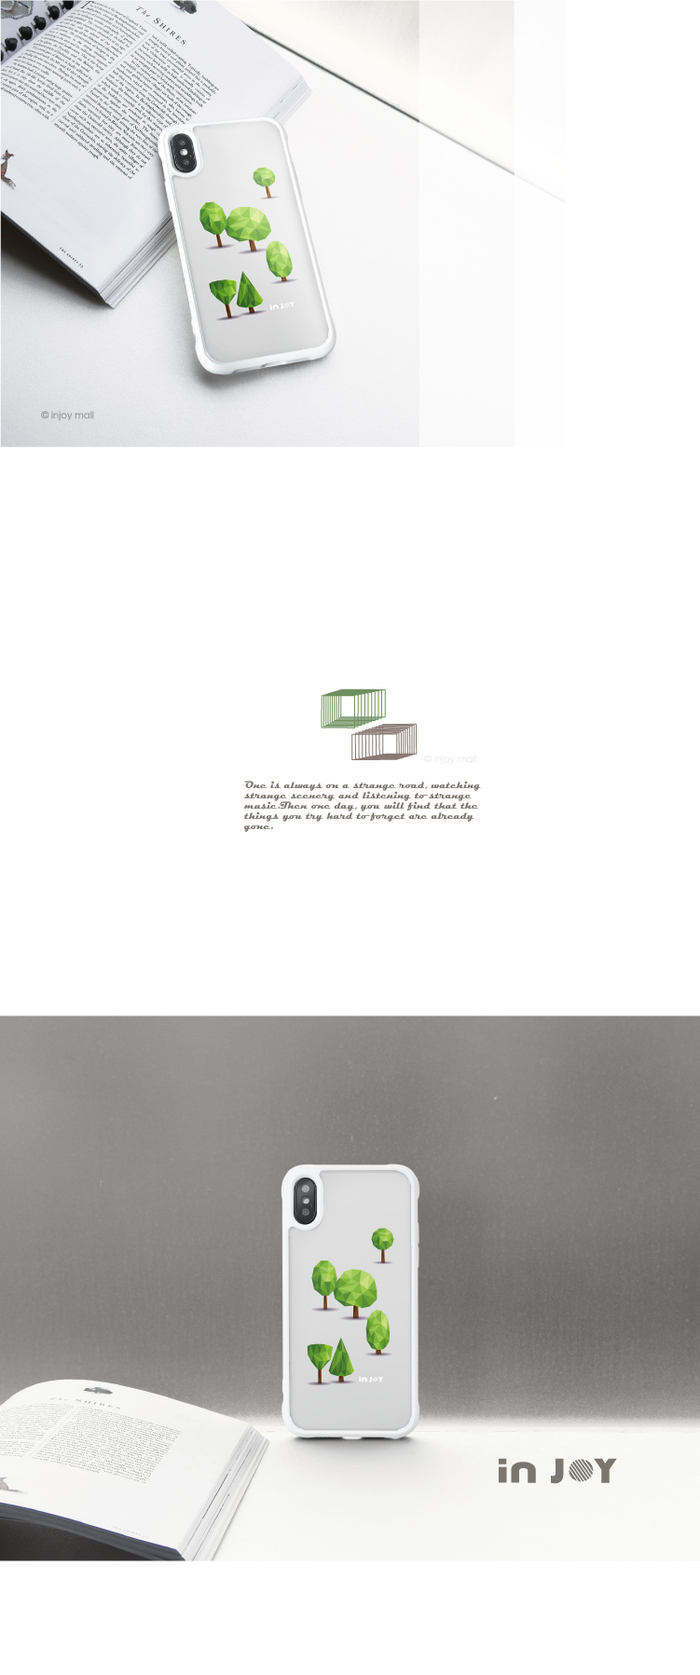 INJOY mall|iPhone 7 / 8 / Plus / X 森林系幾何文青 耐撞擊邊框手機殼 保護套